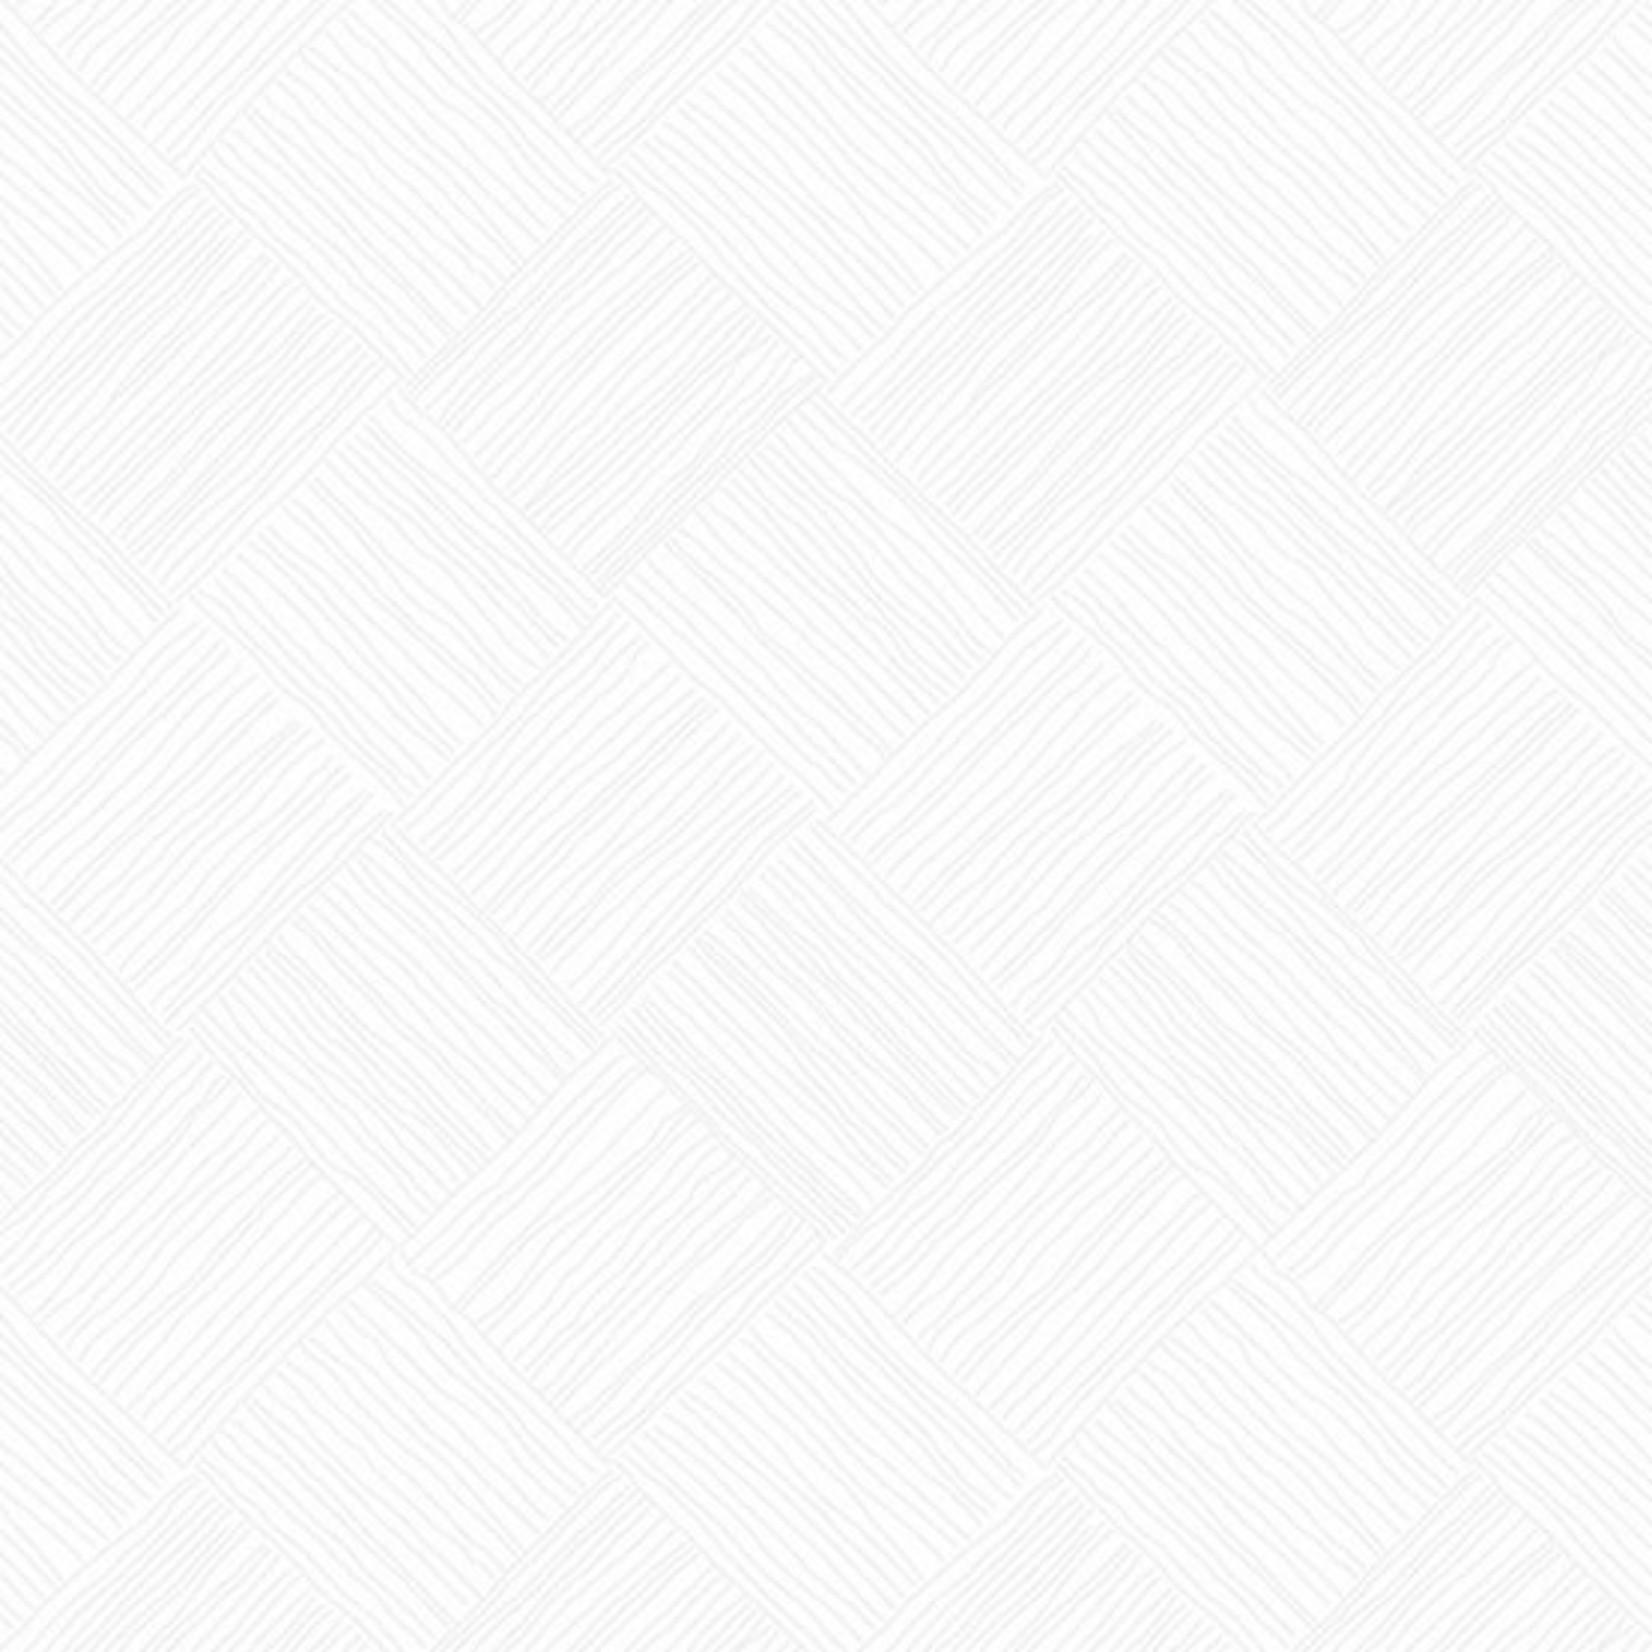 ANDOVER Century Whites, Bias Checkerboard CS-9668-WW $0.18 per cm or $18/m